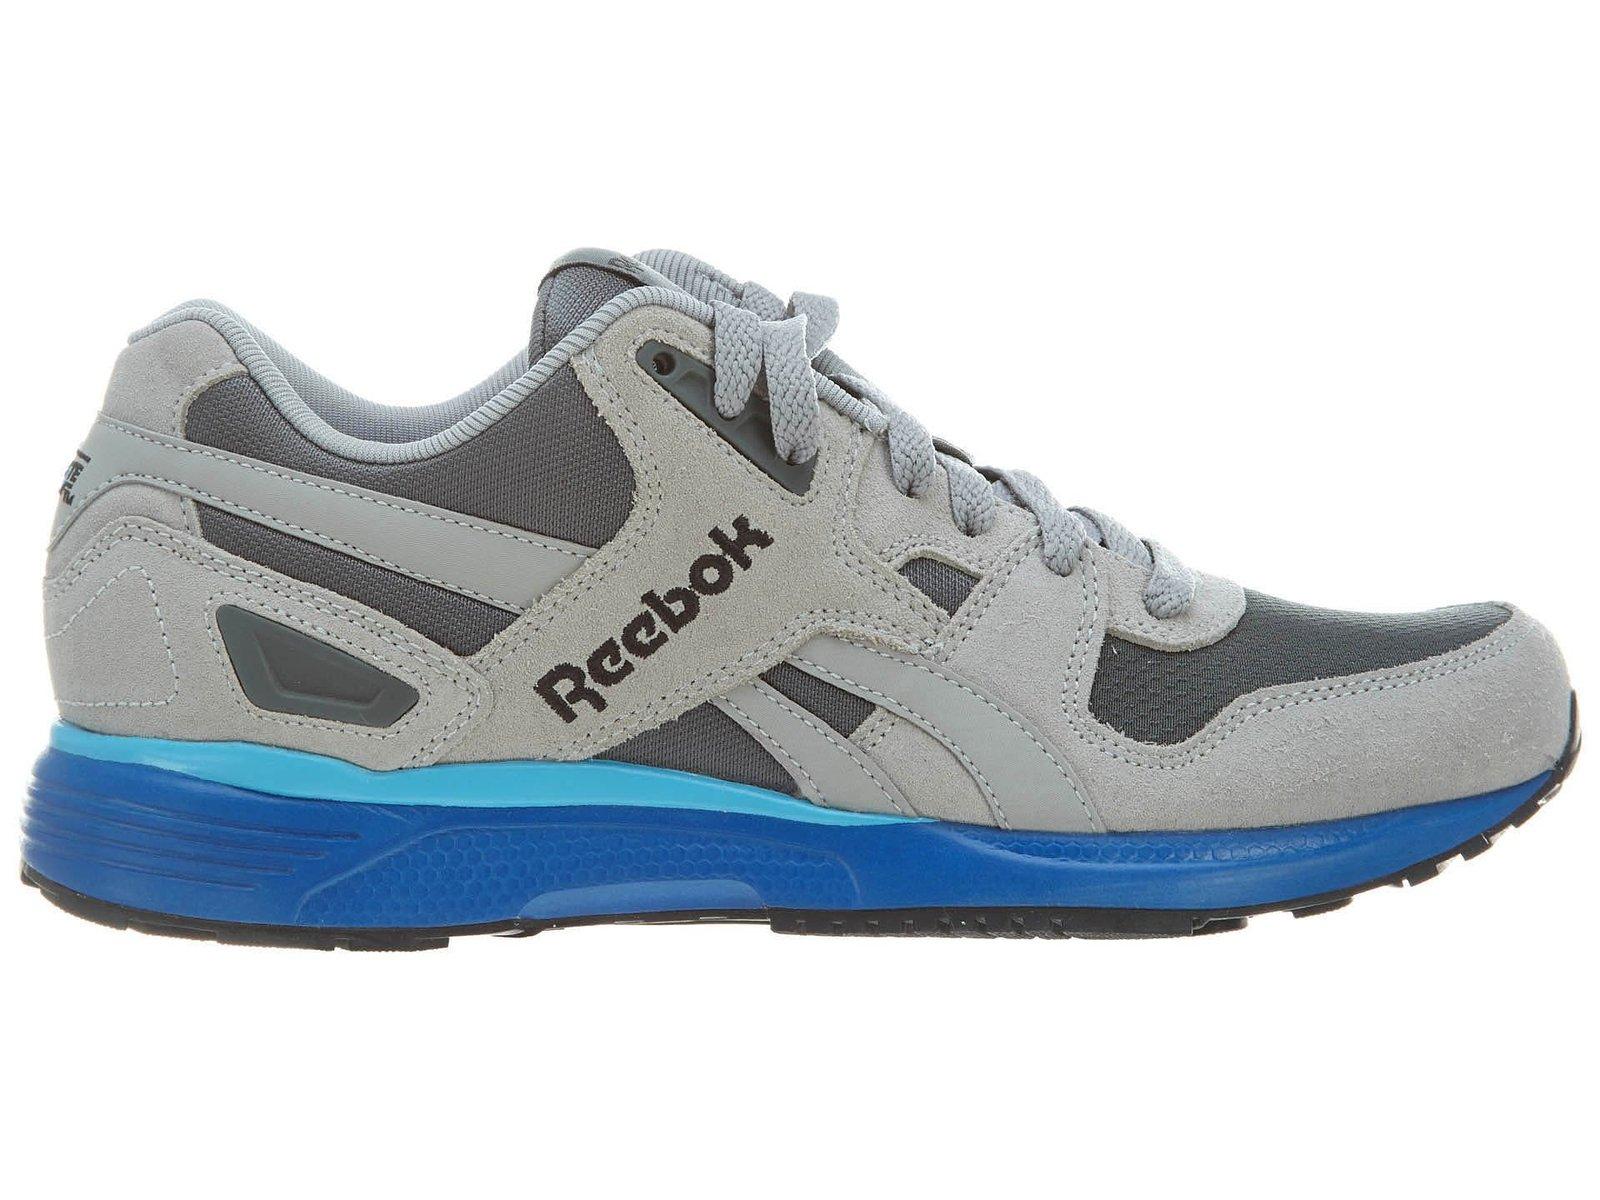 97ec535b Reebok Men's Hexa-Lator Sneaker,Light and 50 similar items